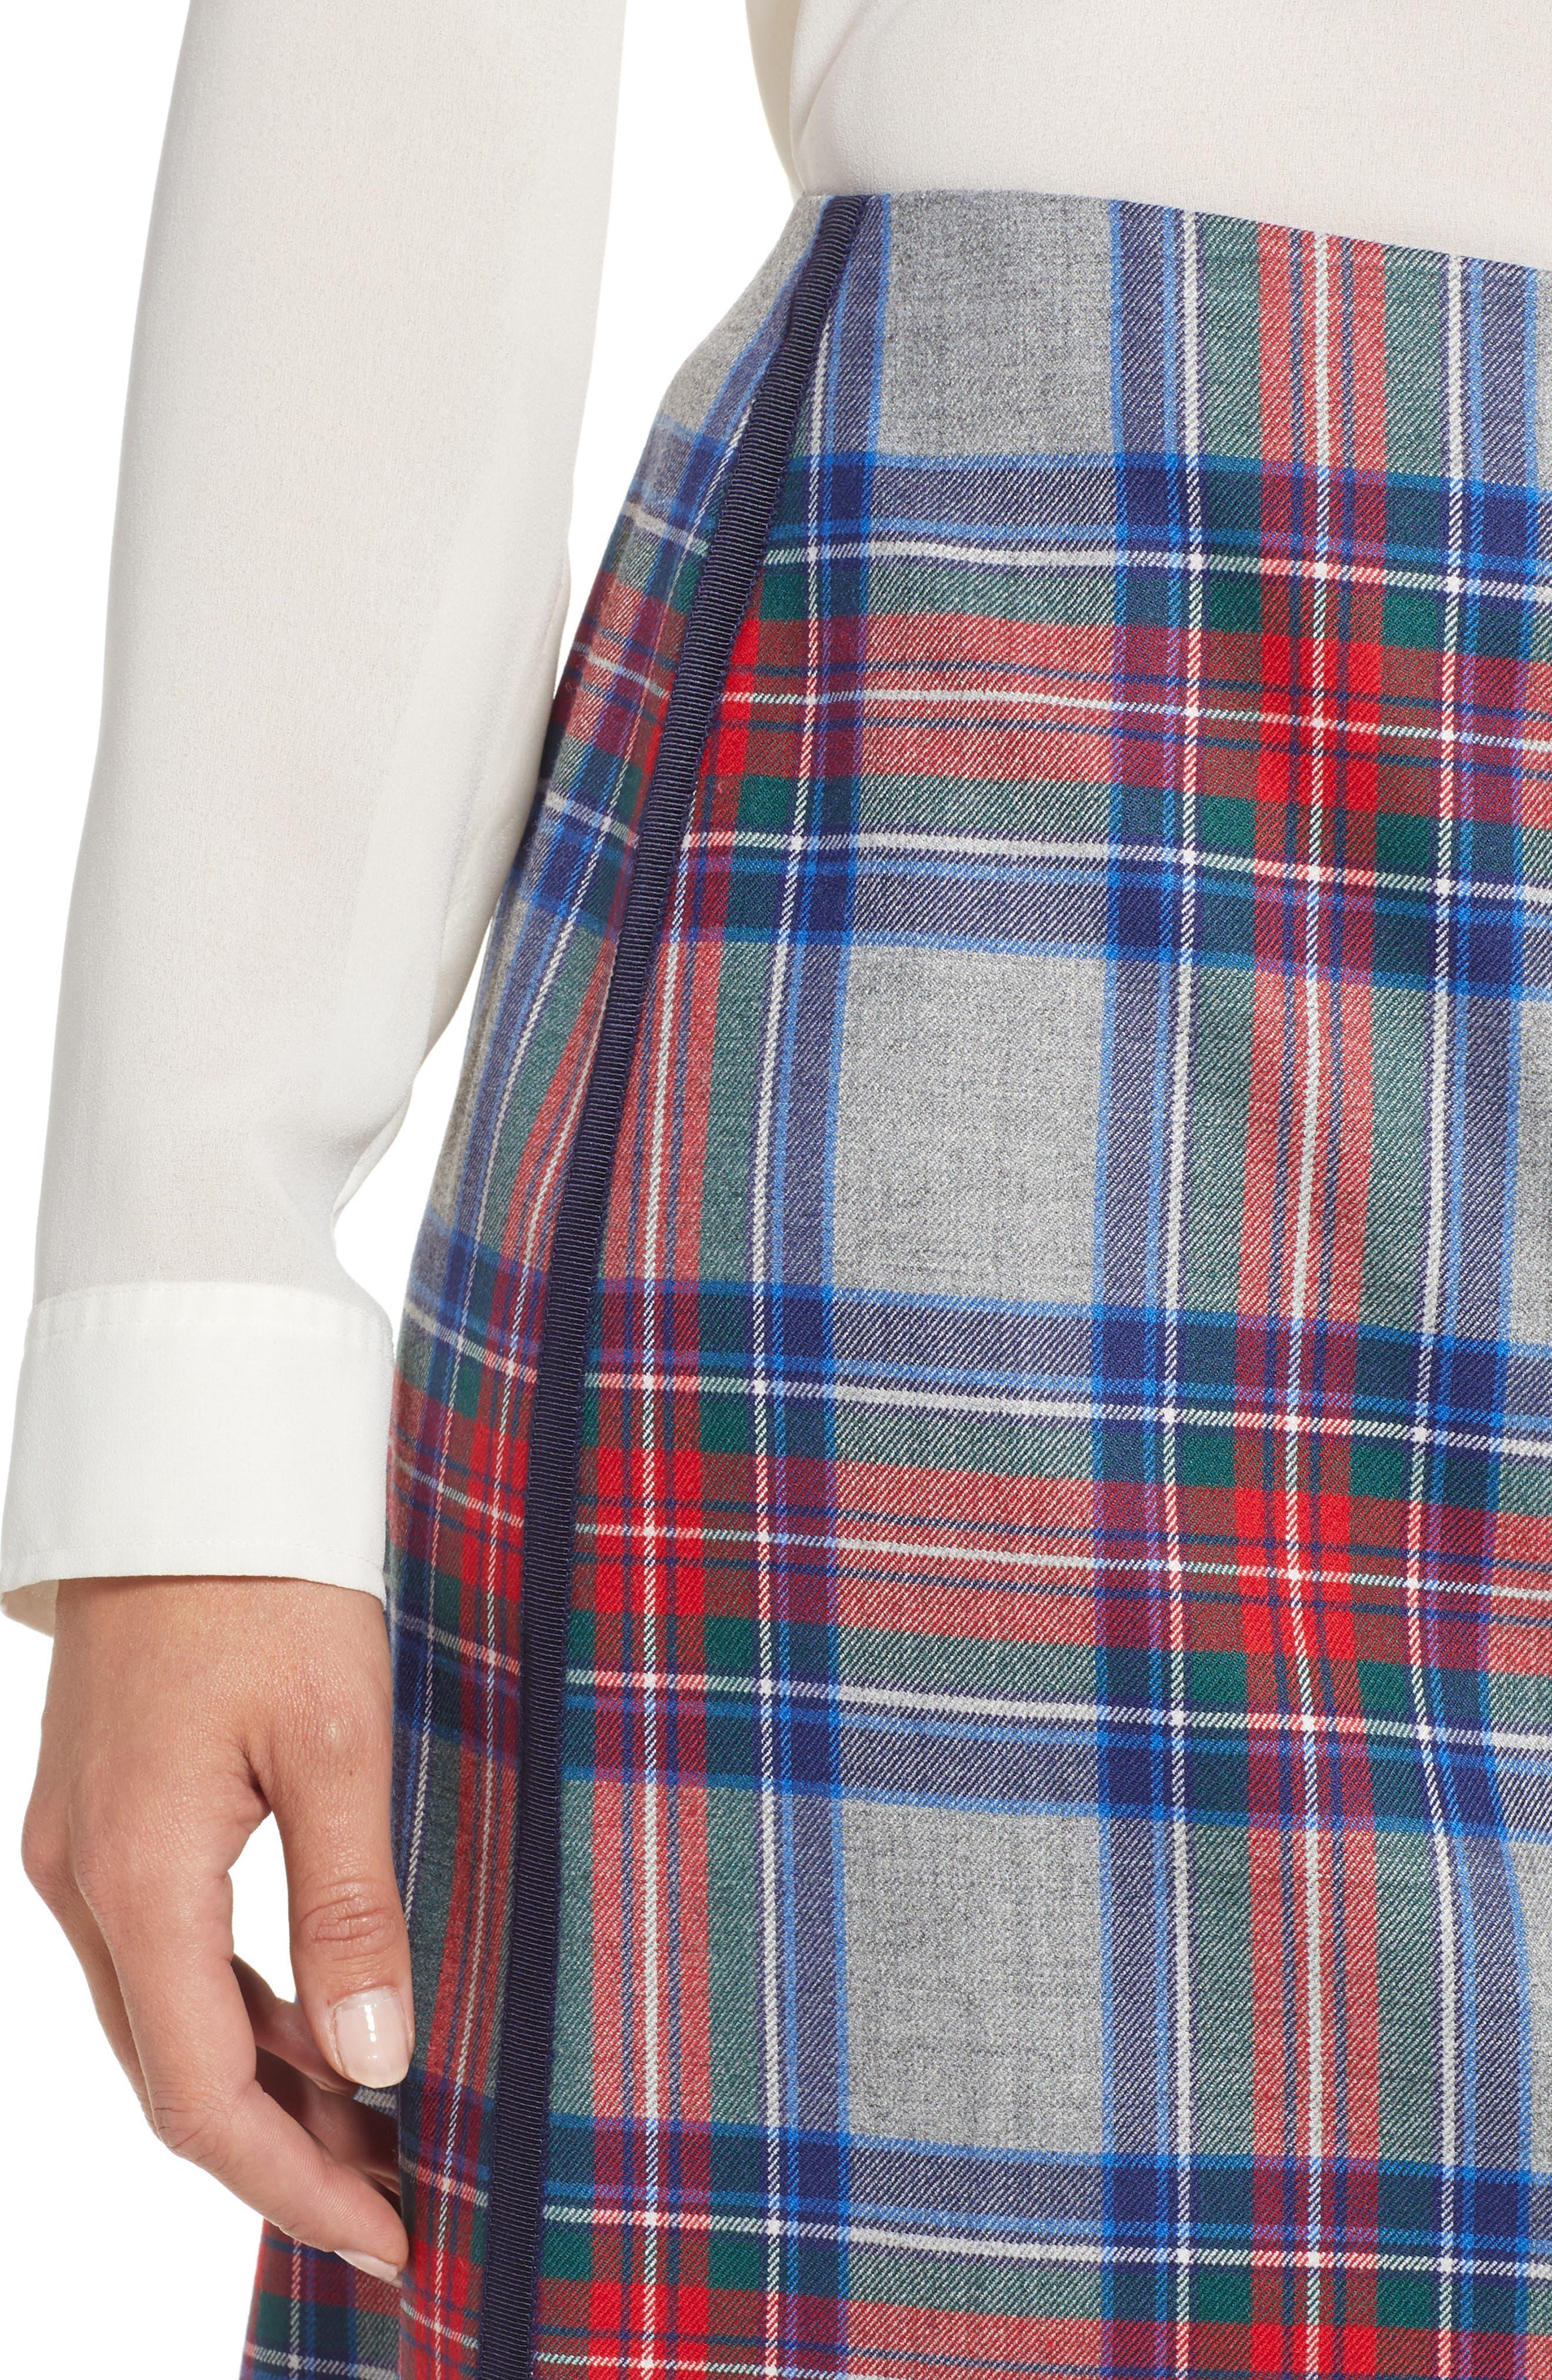 Jolly Plaid Miniskirt,                             Alternate thumbnail 4, color,                             GRAY HEATHER